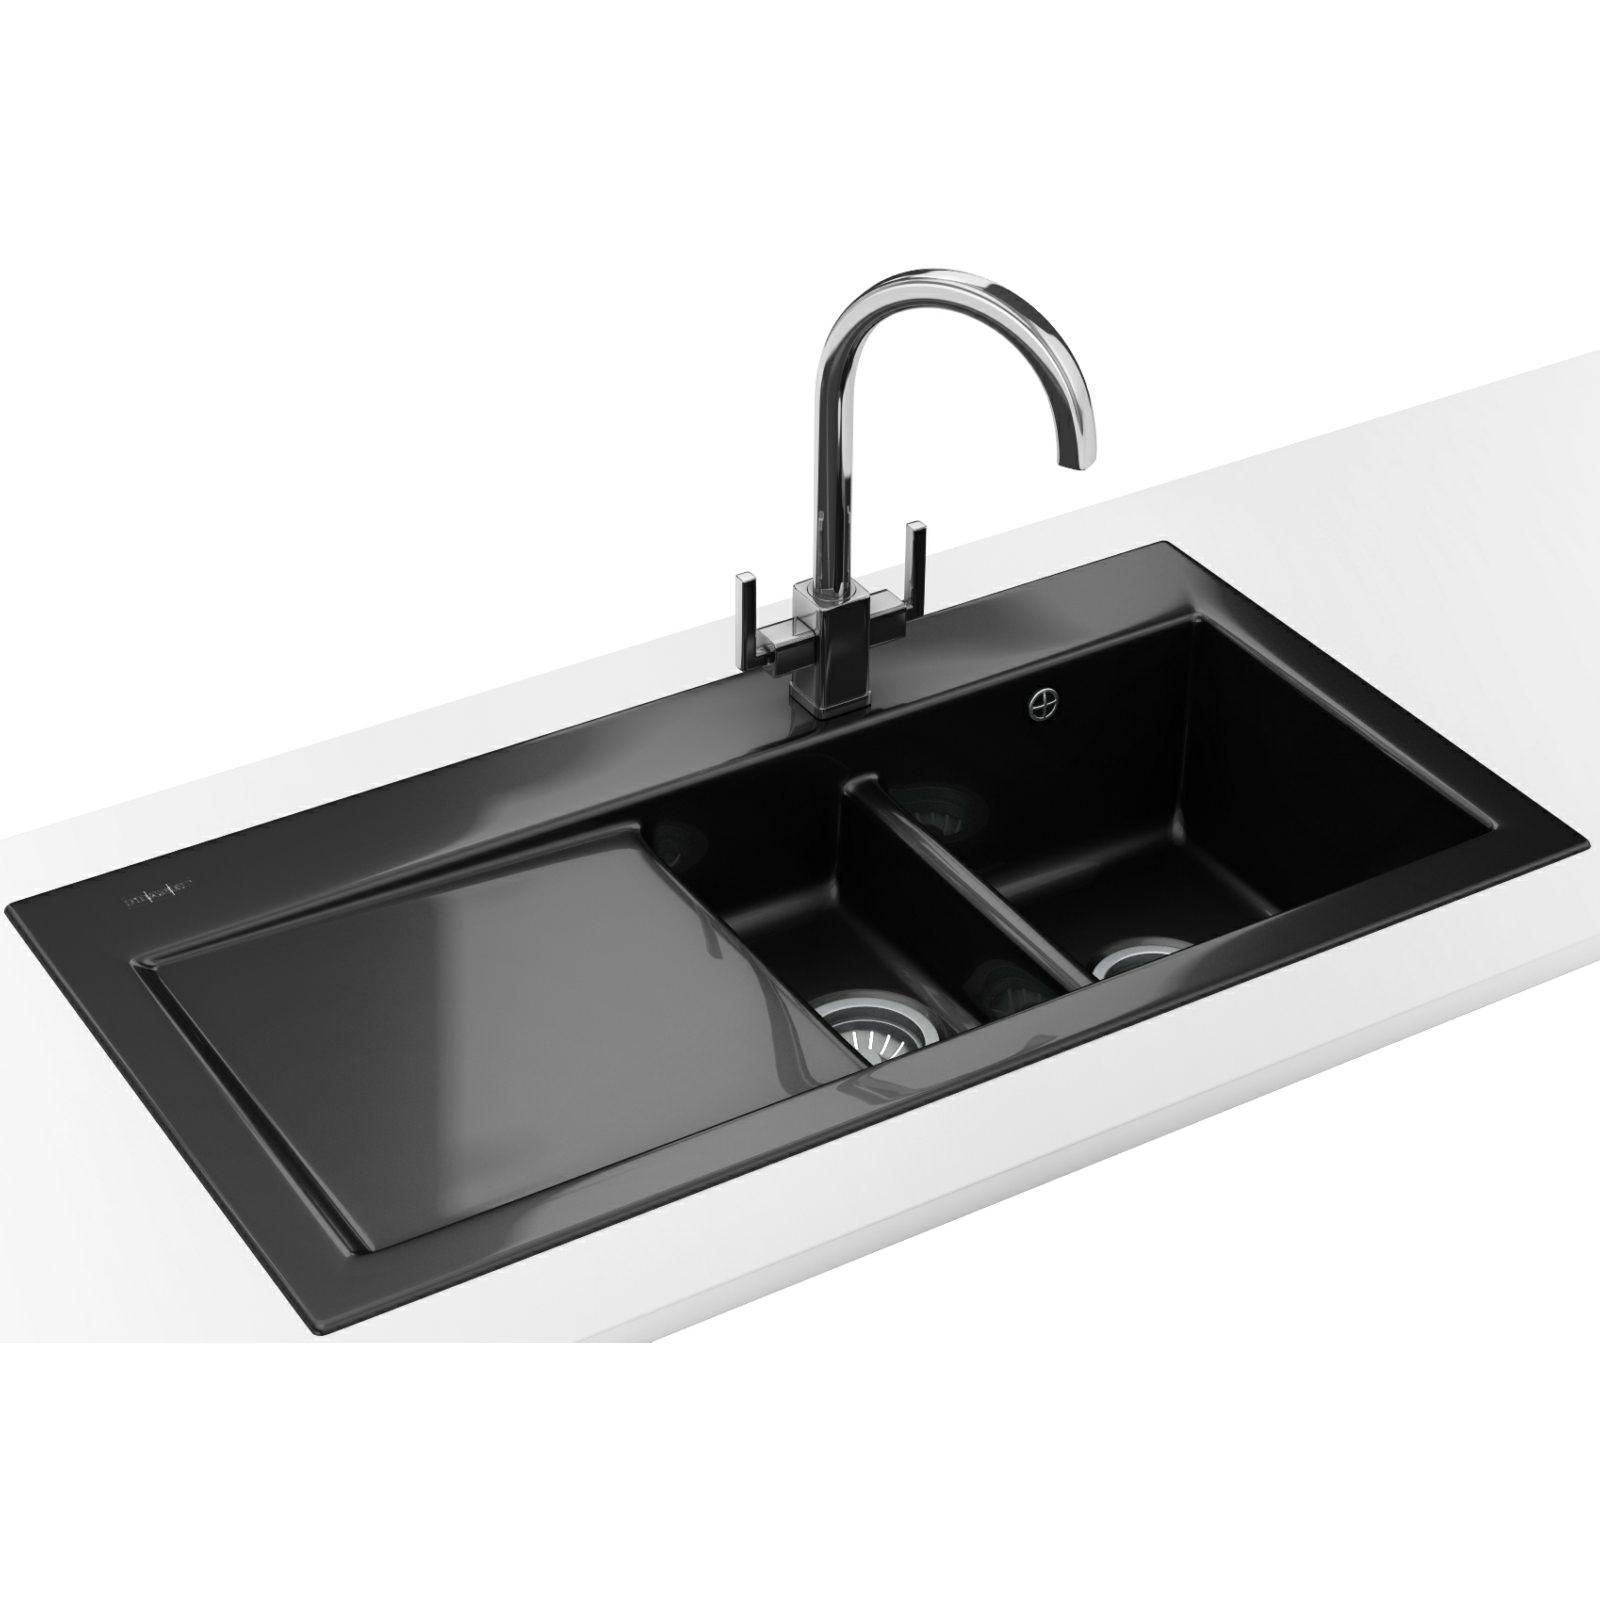 Black Ceramic   Bowl Kitchen Sink